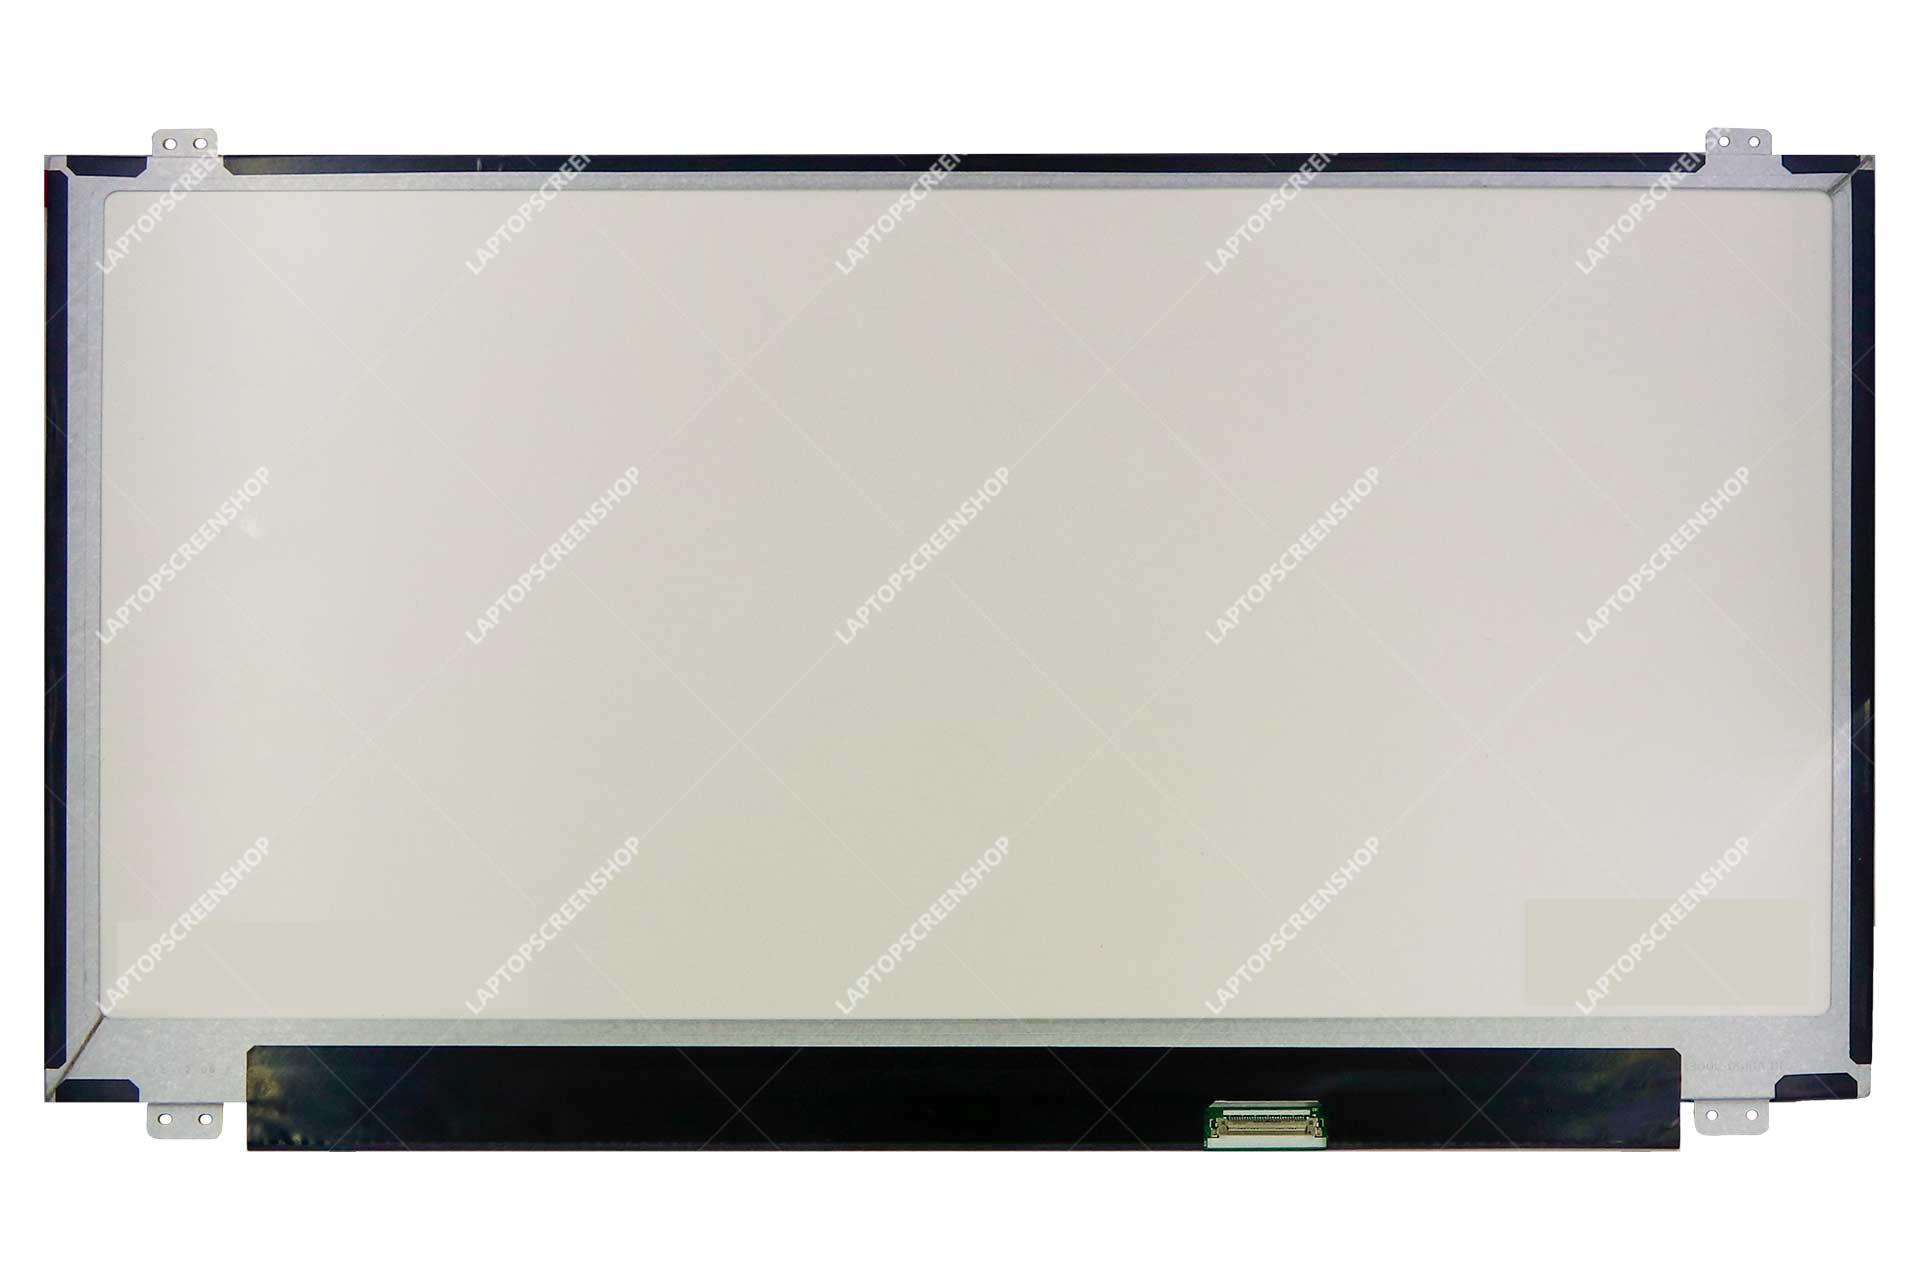 ACER-ASPIRE-E1-510-2483-LCD |HD|فروشگاه لپ تاپ اسکرين | تعمير لپ تاپ